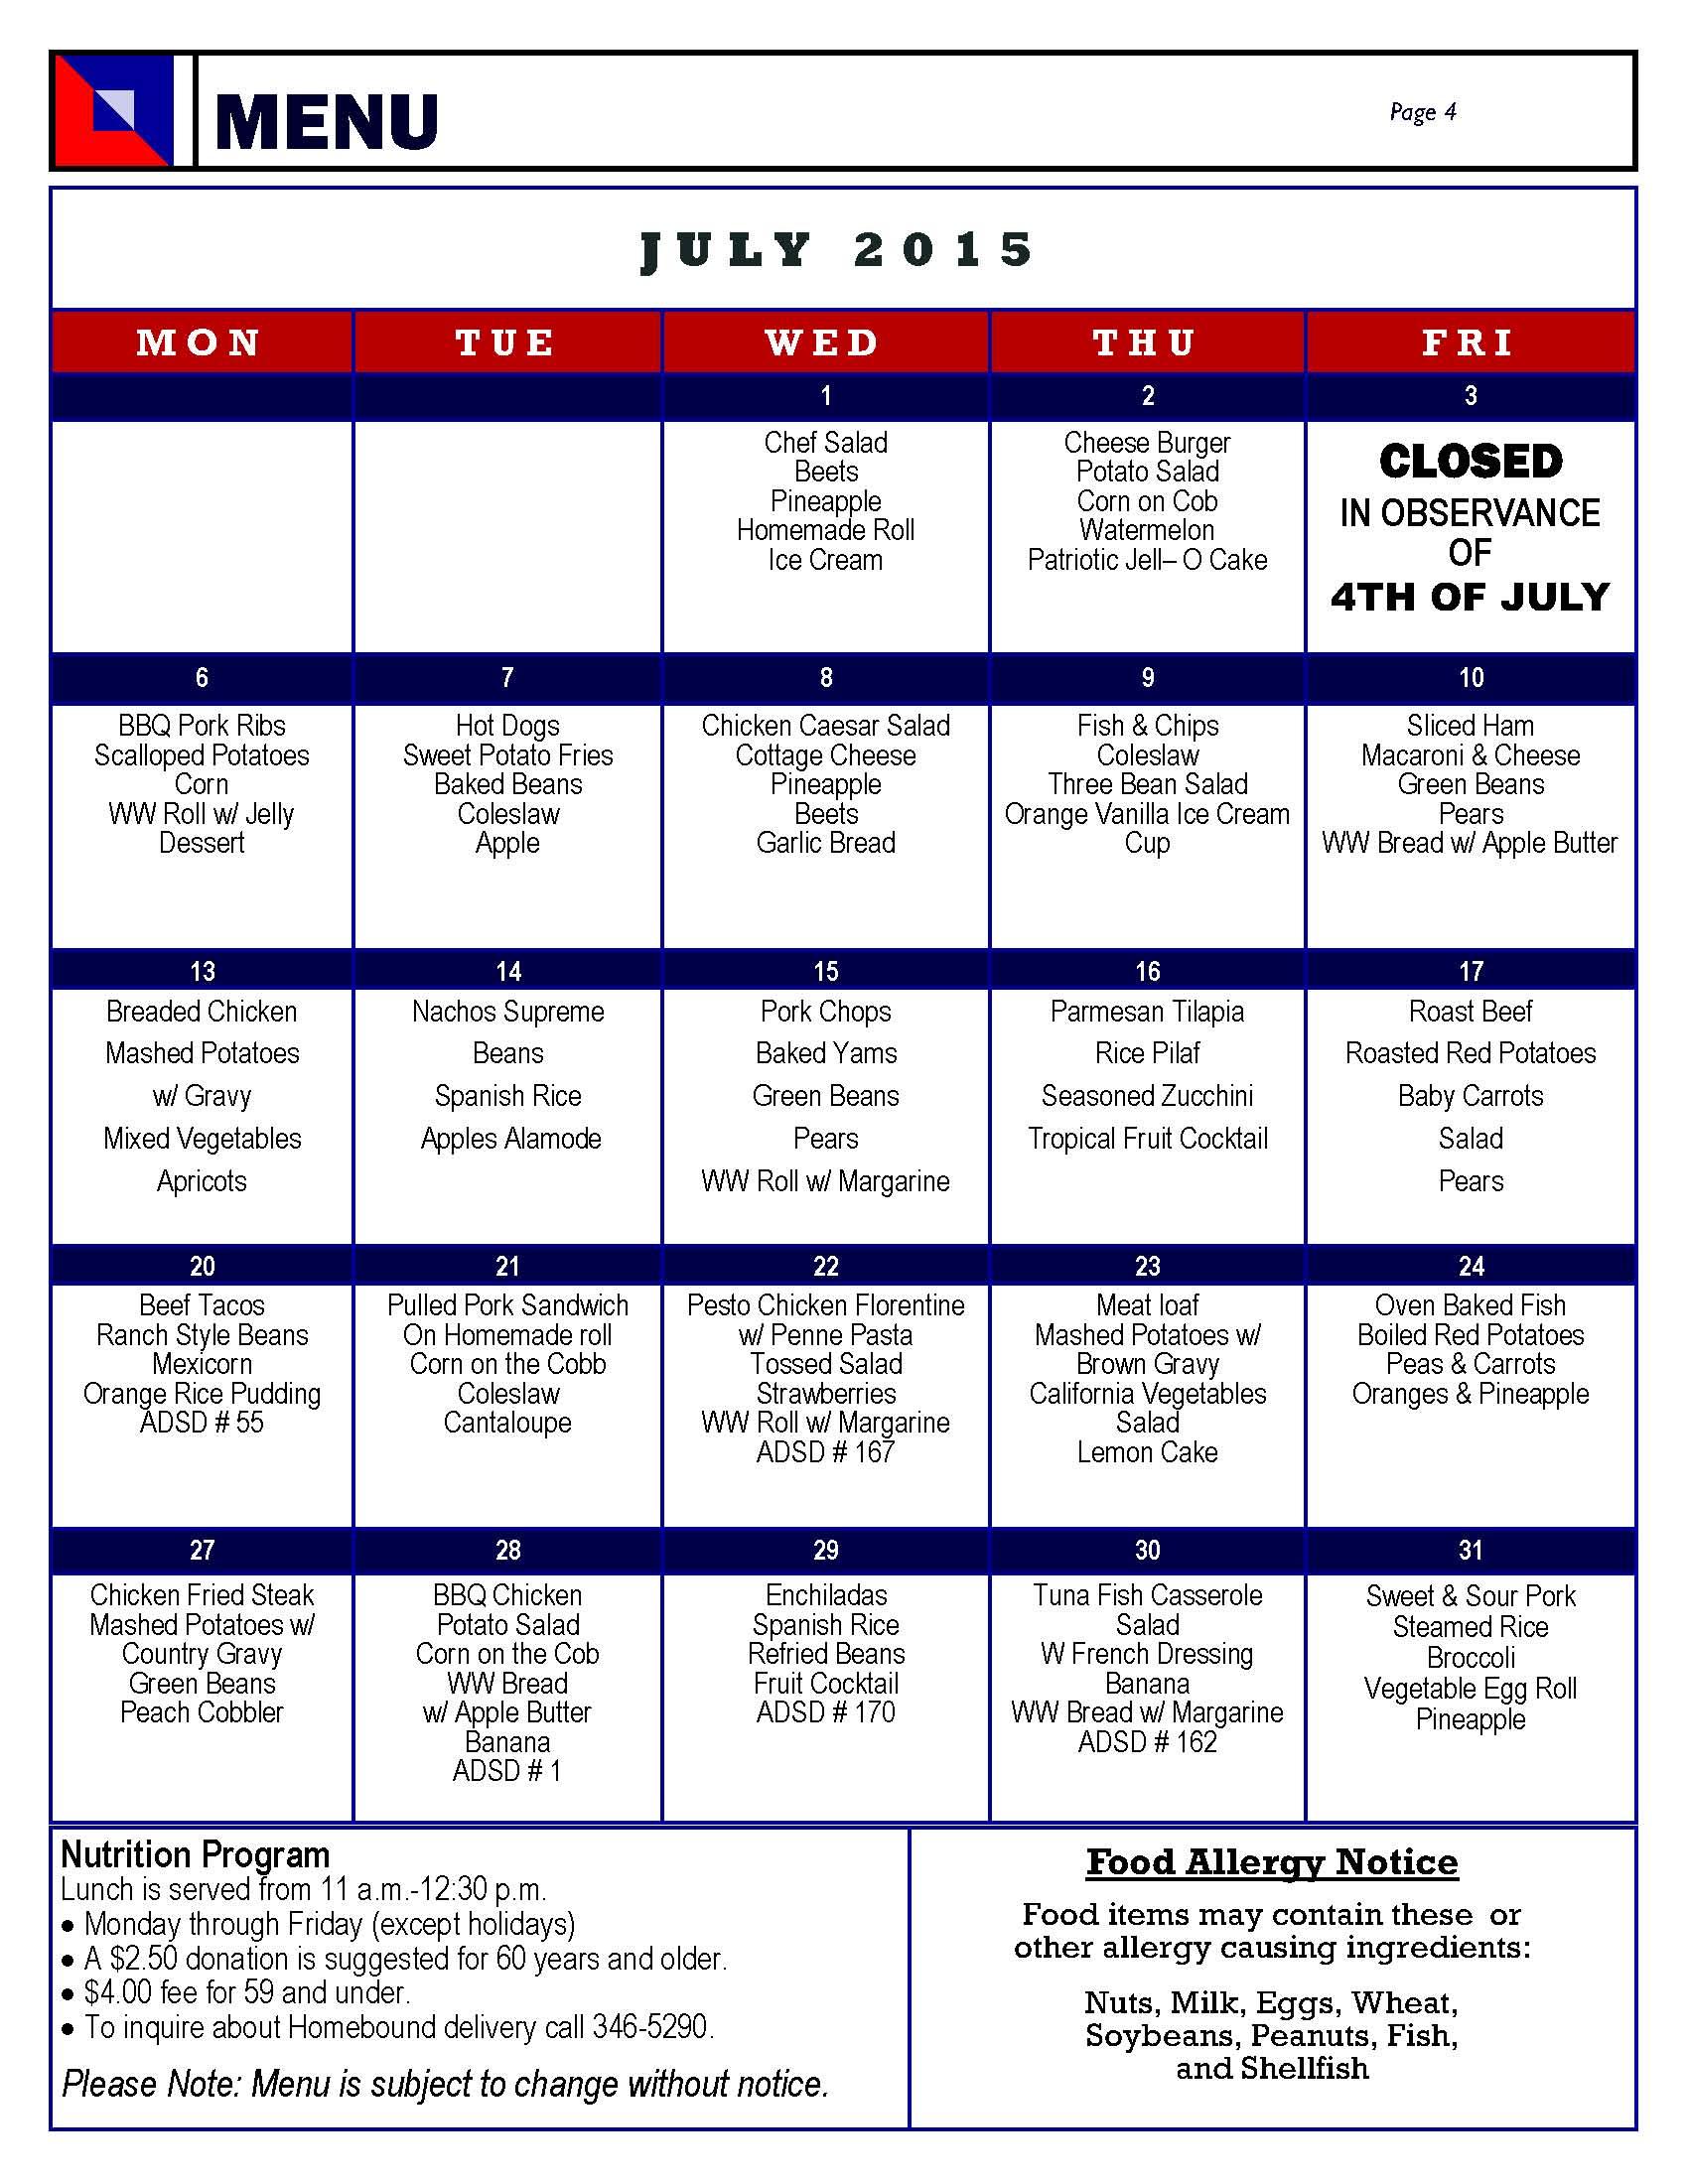 Senior Center Menu July 2015